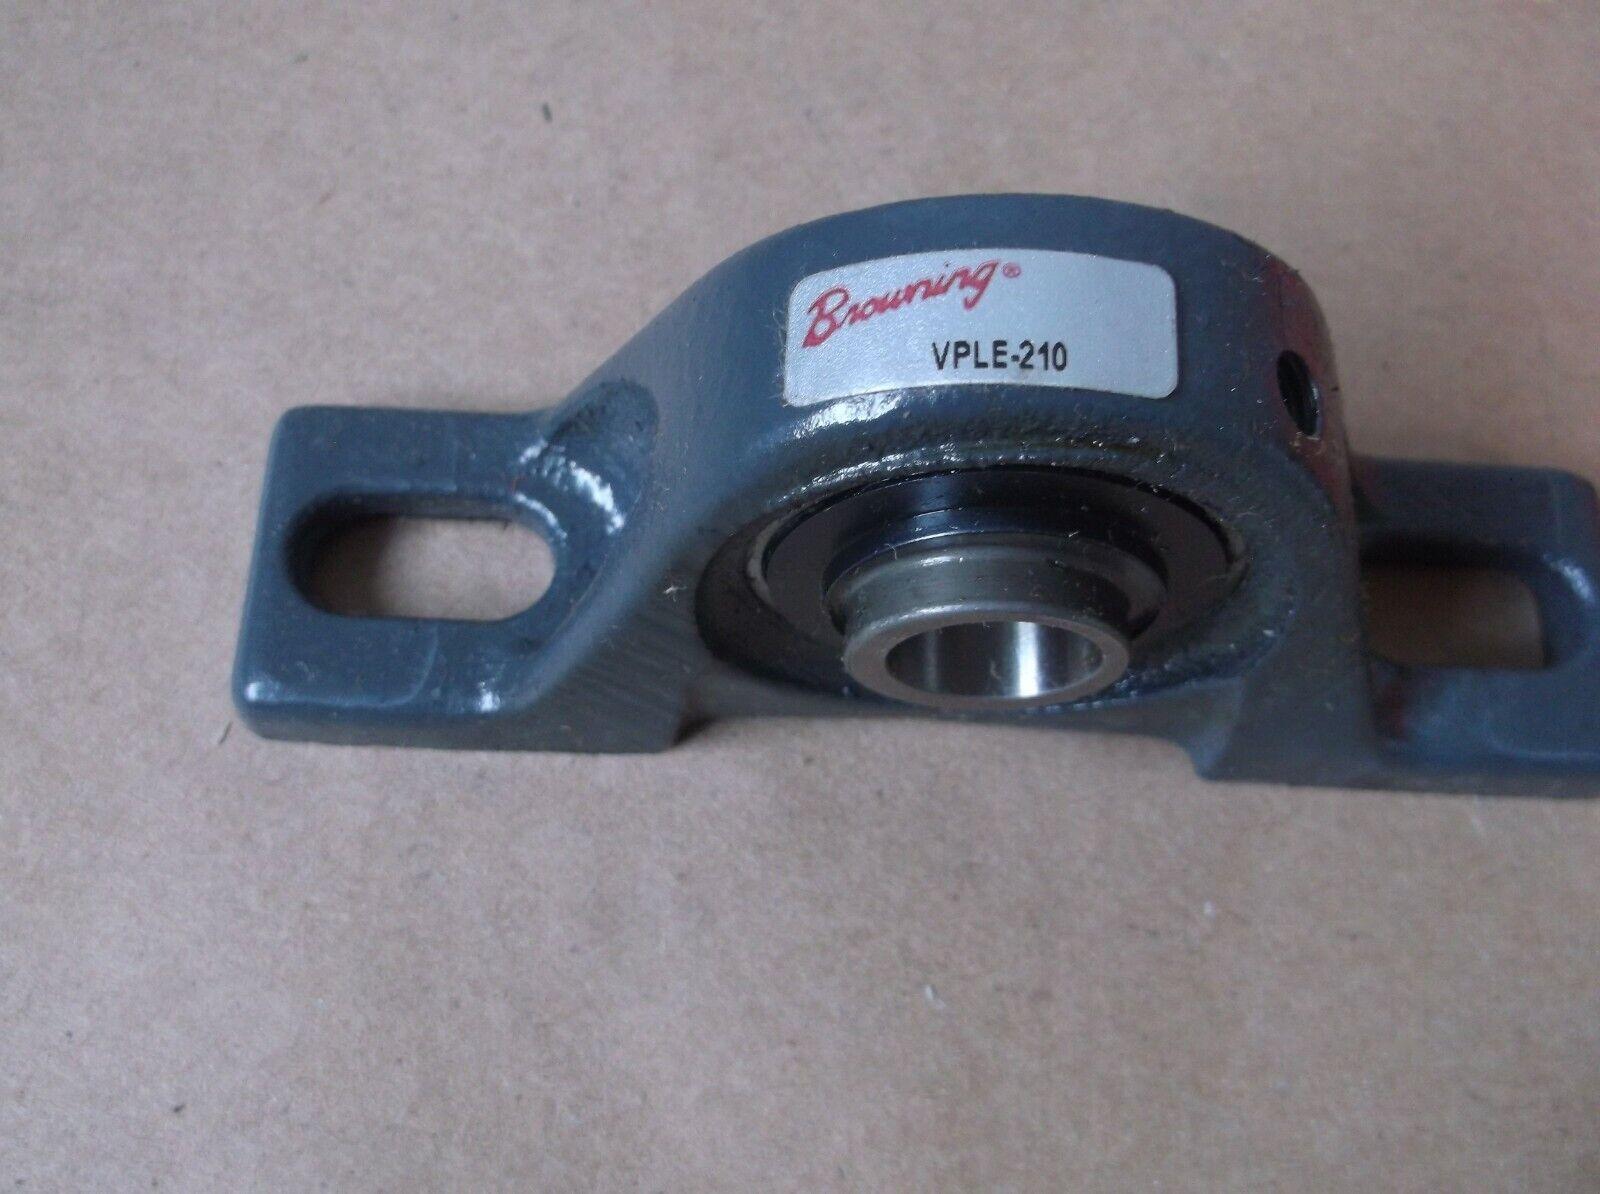 Browning VPLE-210